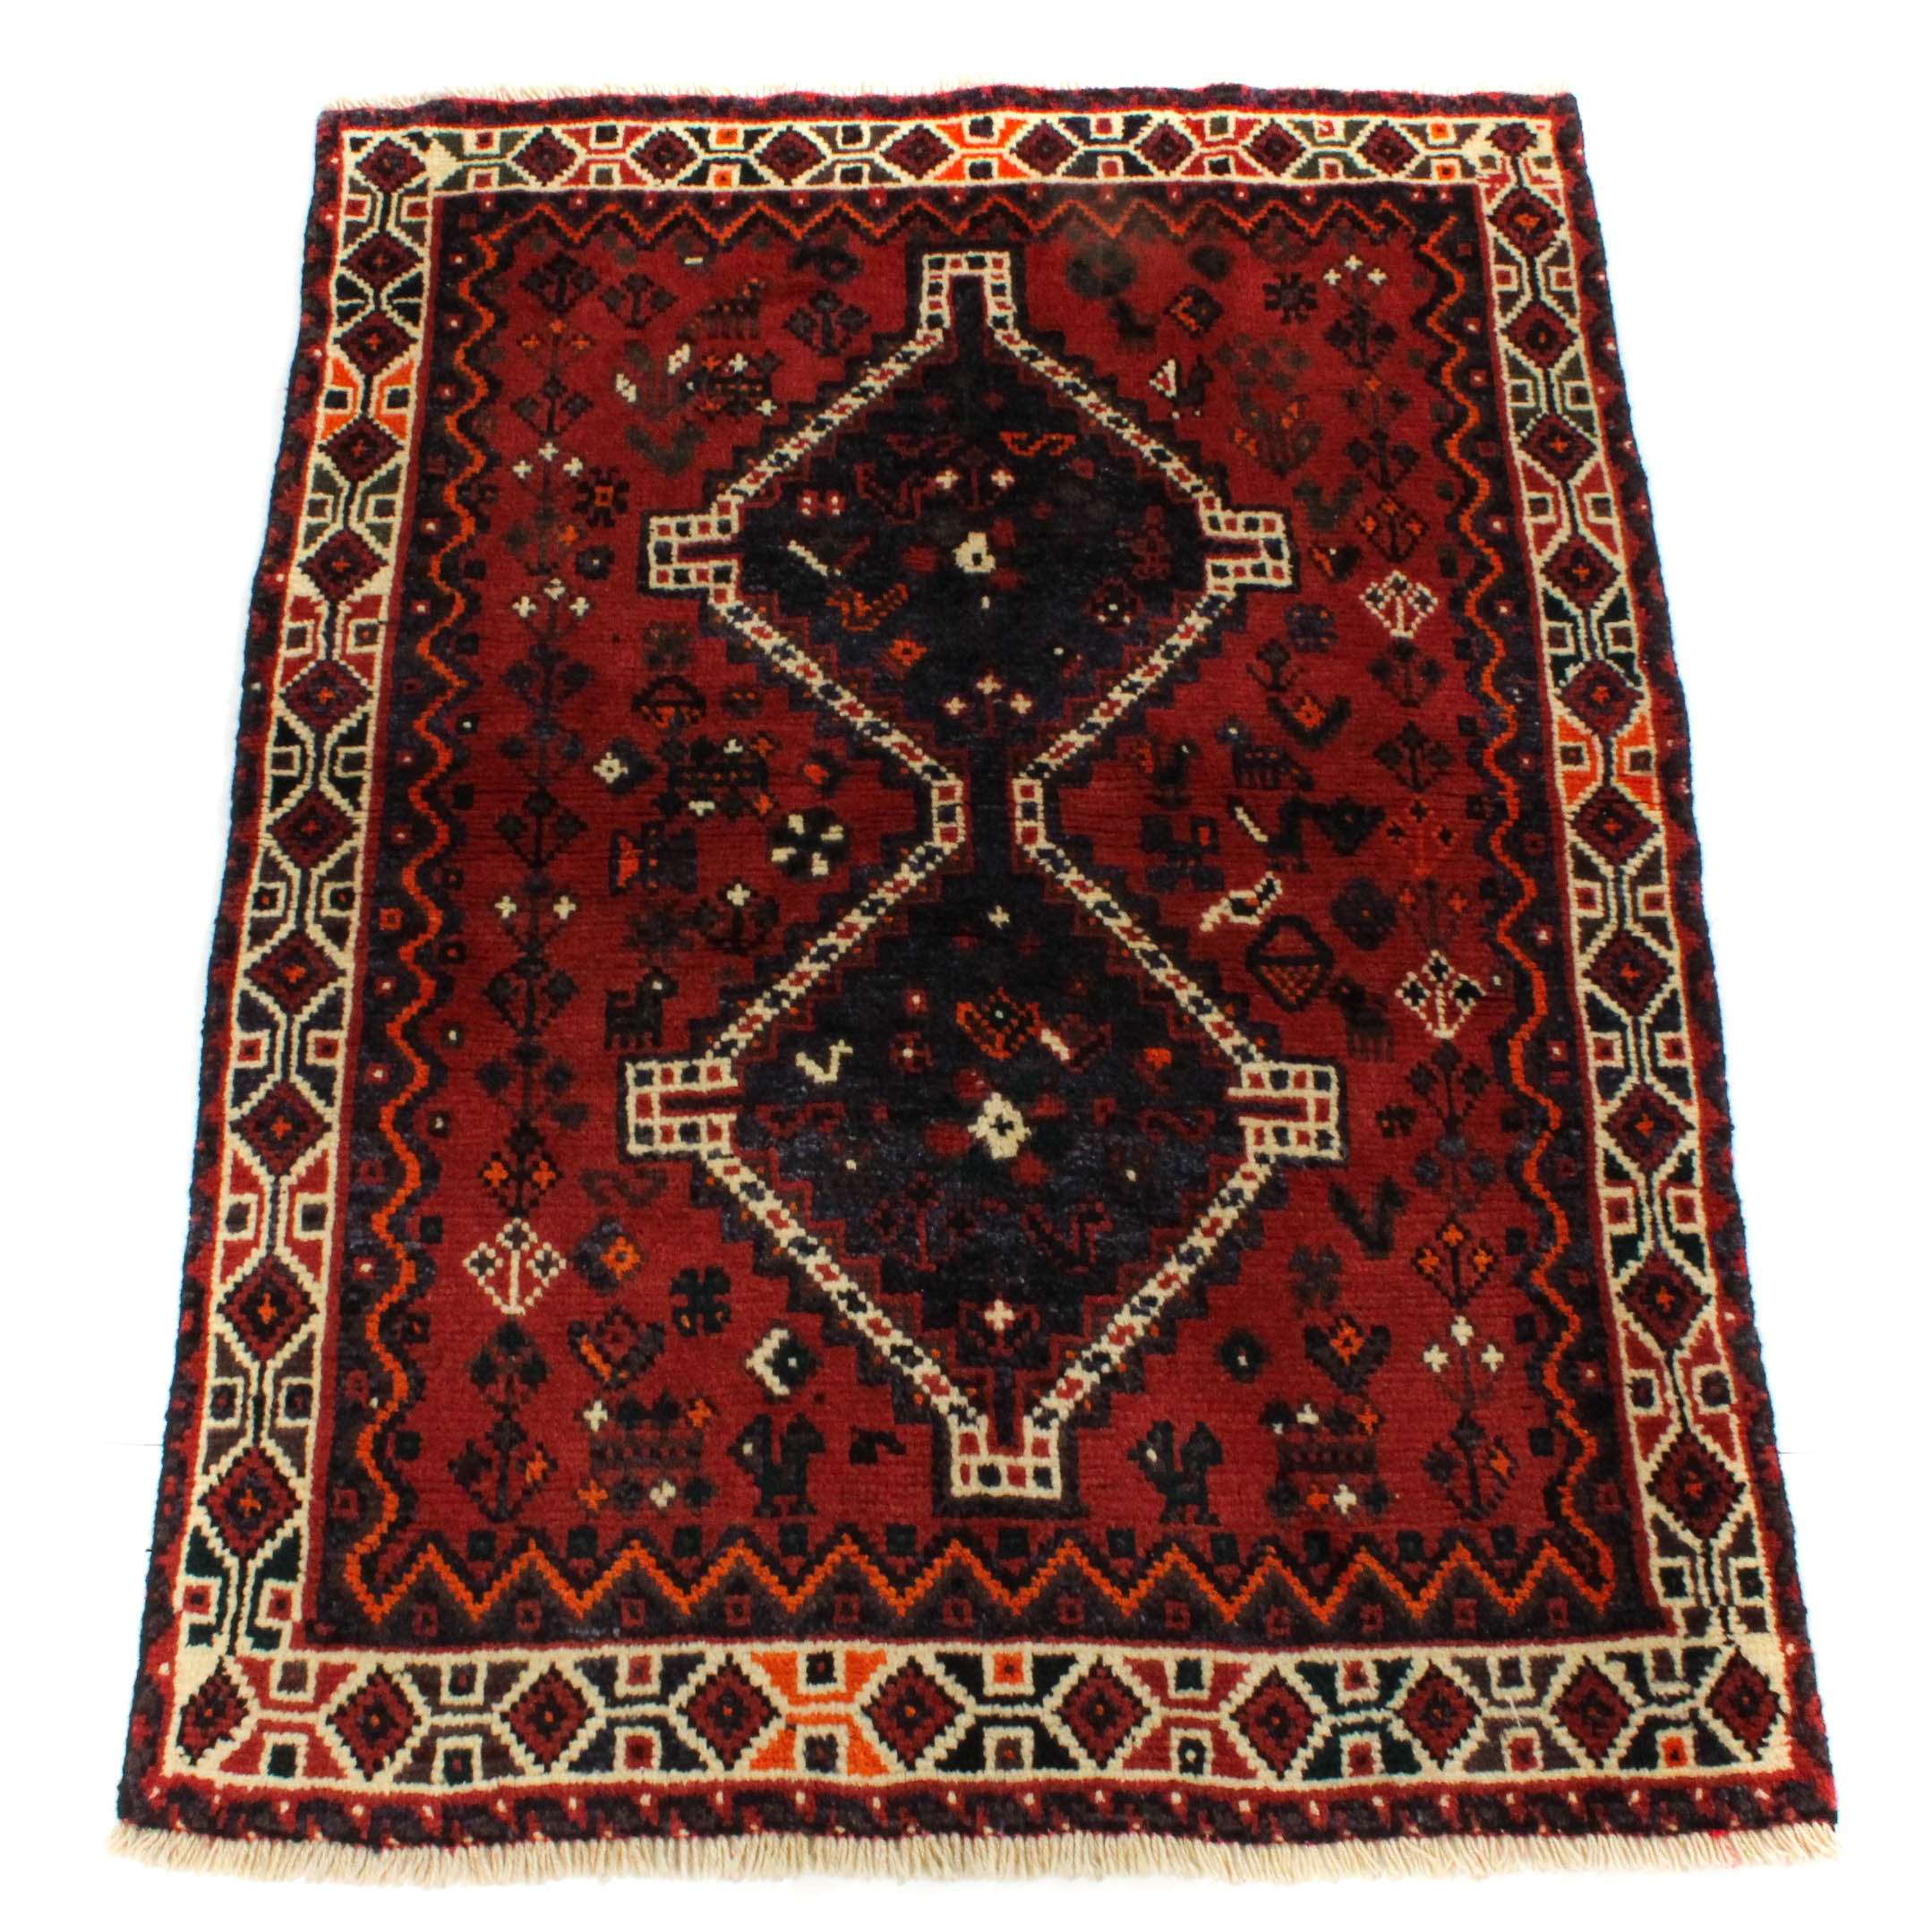 3'4 x 4'9 Semi-Antique Hand-Knotted Persian Shiraz Rug